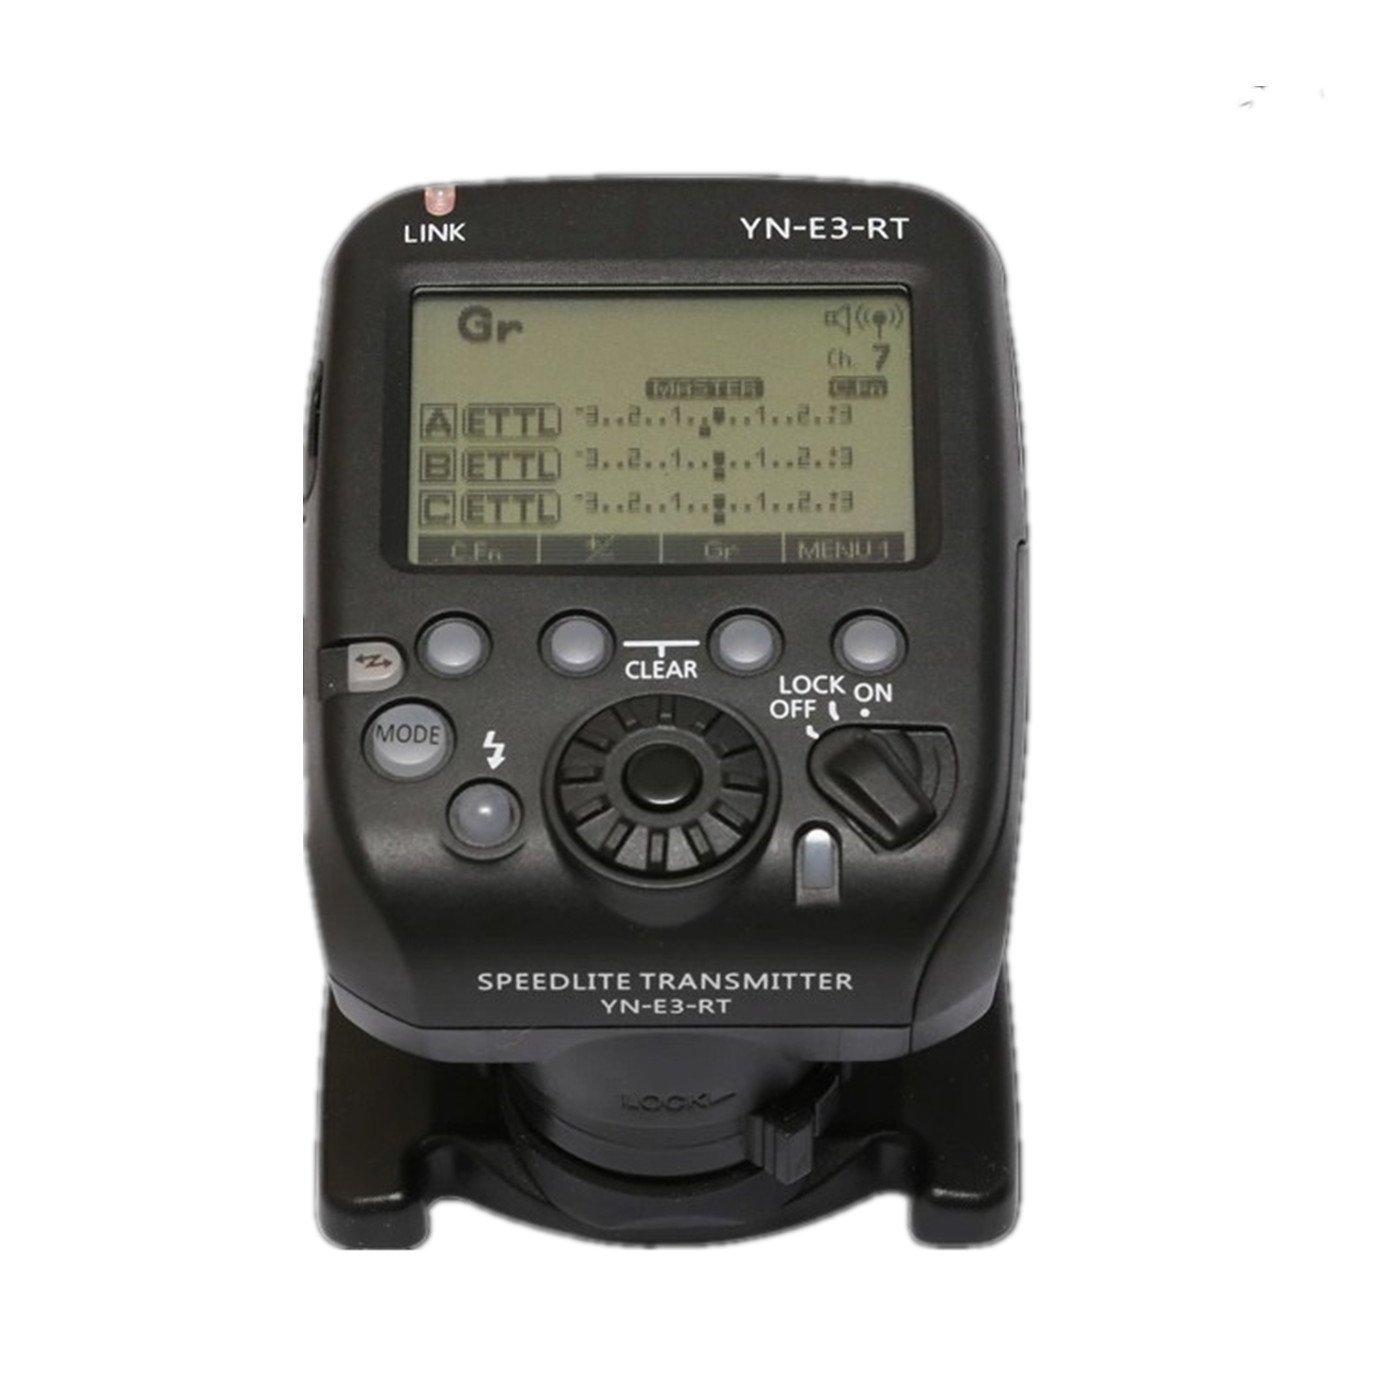 Yongnuo inalámbrico transmisor speedlite yn e3-rt Para canon st-e3-rt/600ex rt